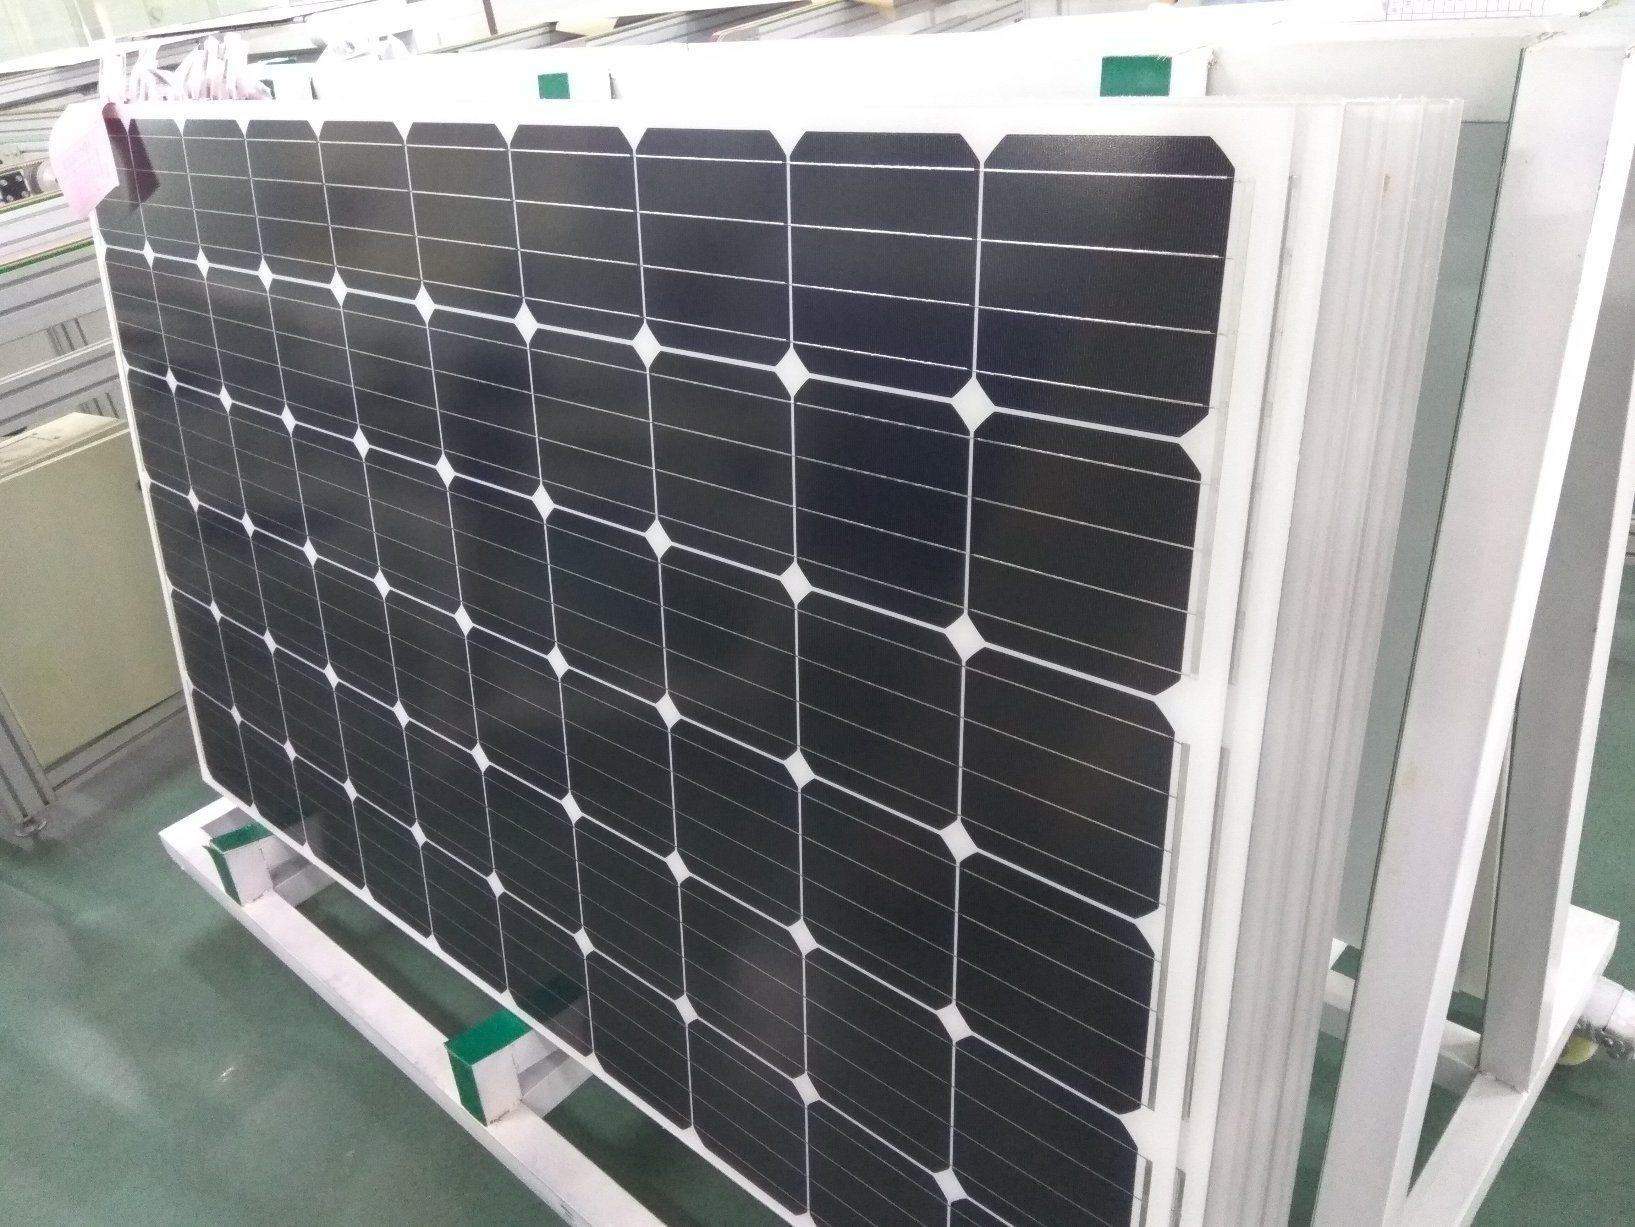 Long-Term Durability Anodized Black Aluminum Frame Mono 270W Solar Panel